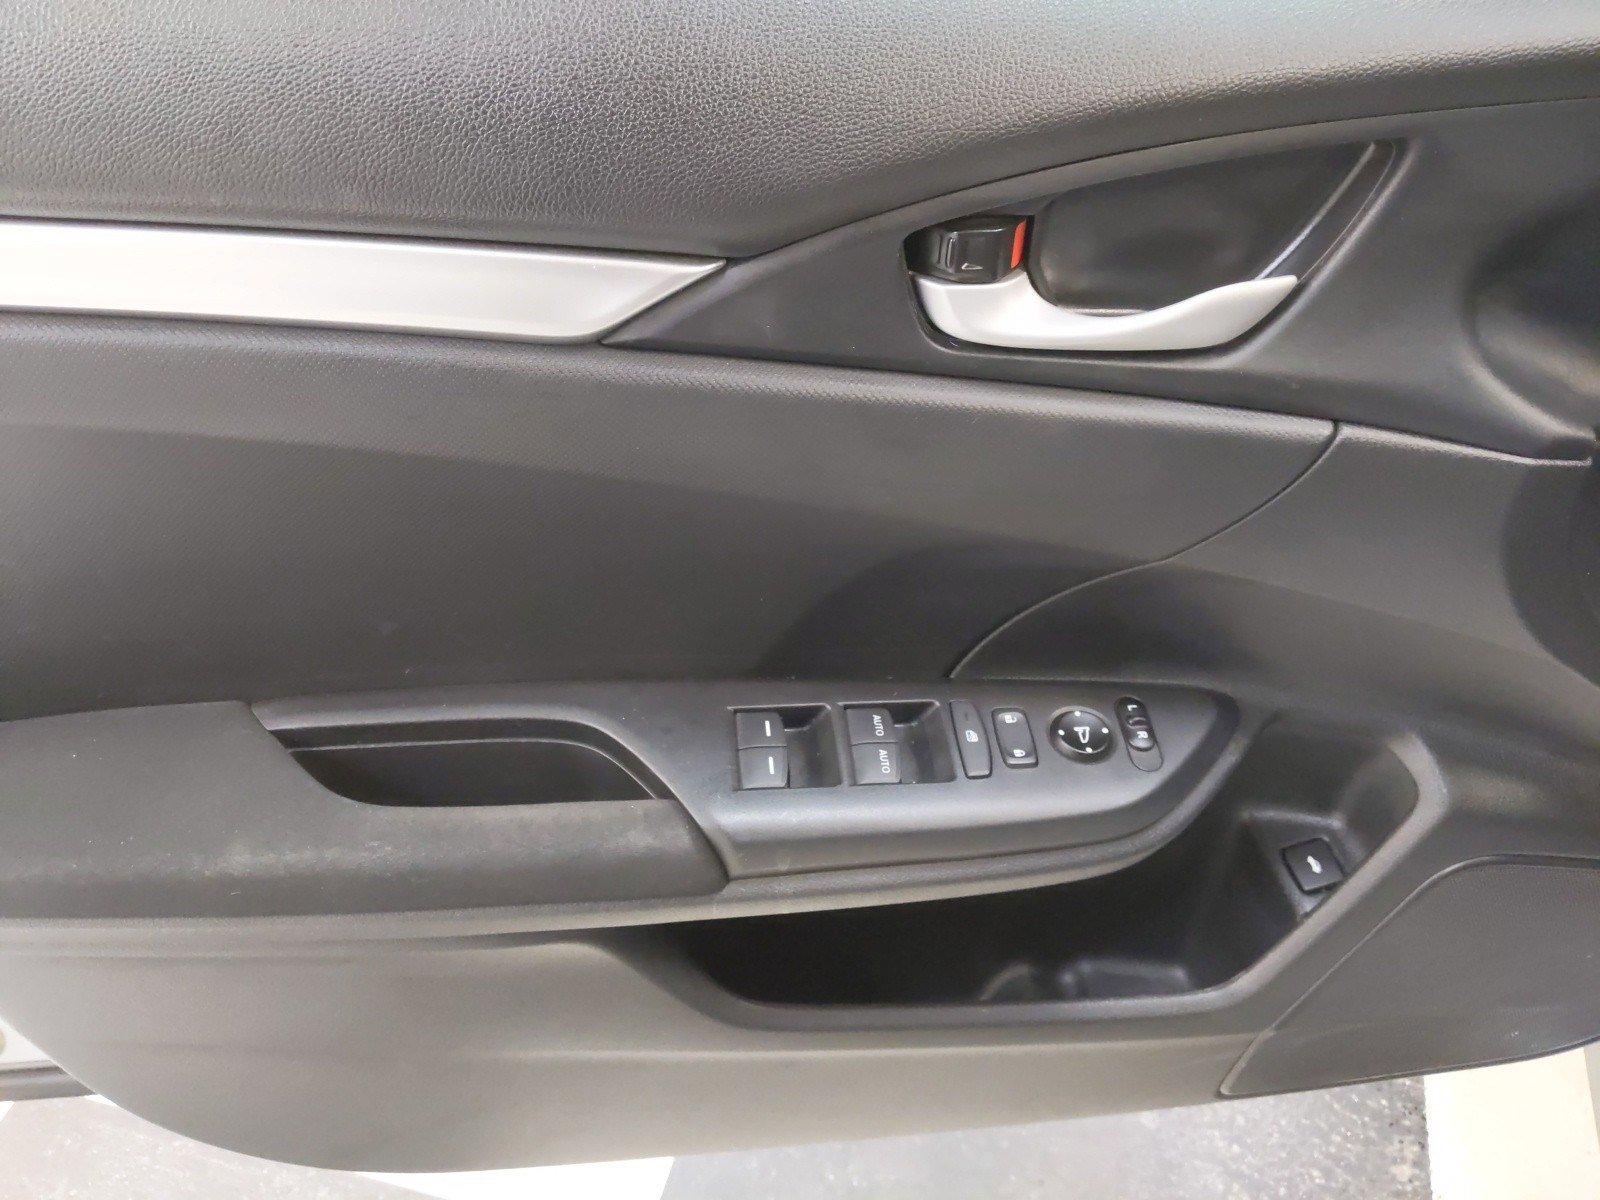 Used 2017 Honda Civic LX 4D Sedan for sale in Grand Island NE